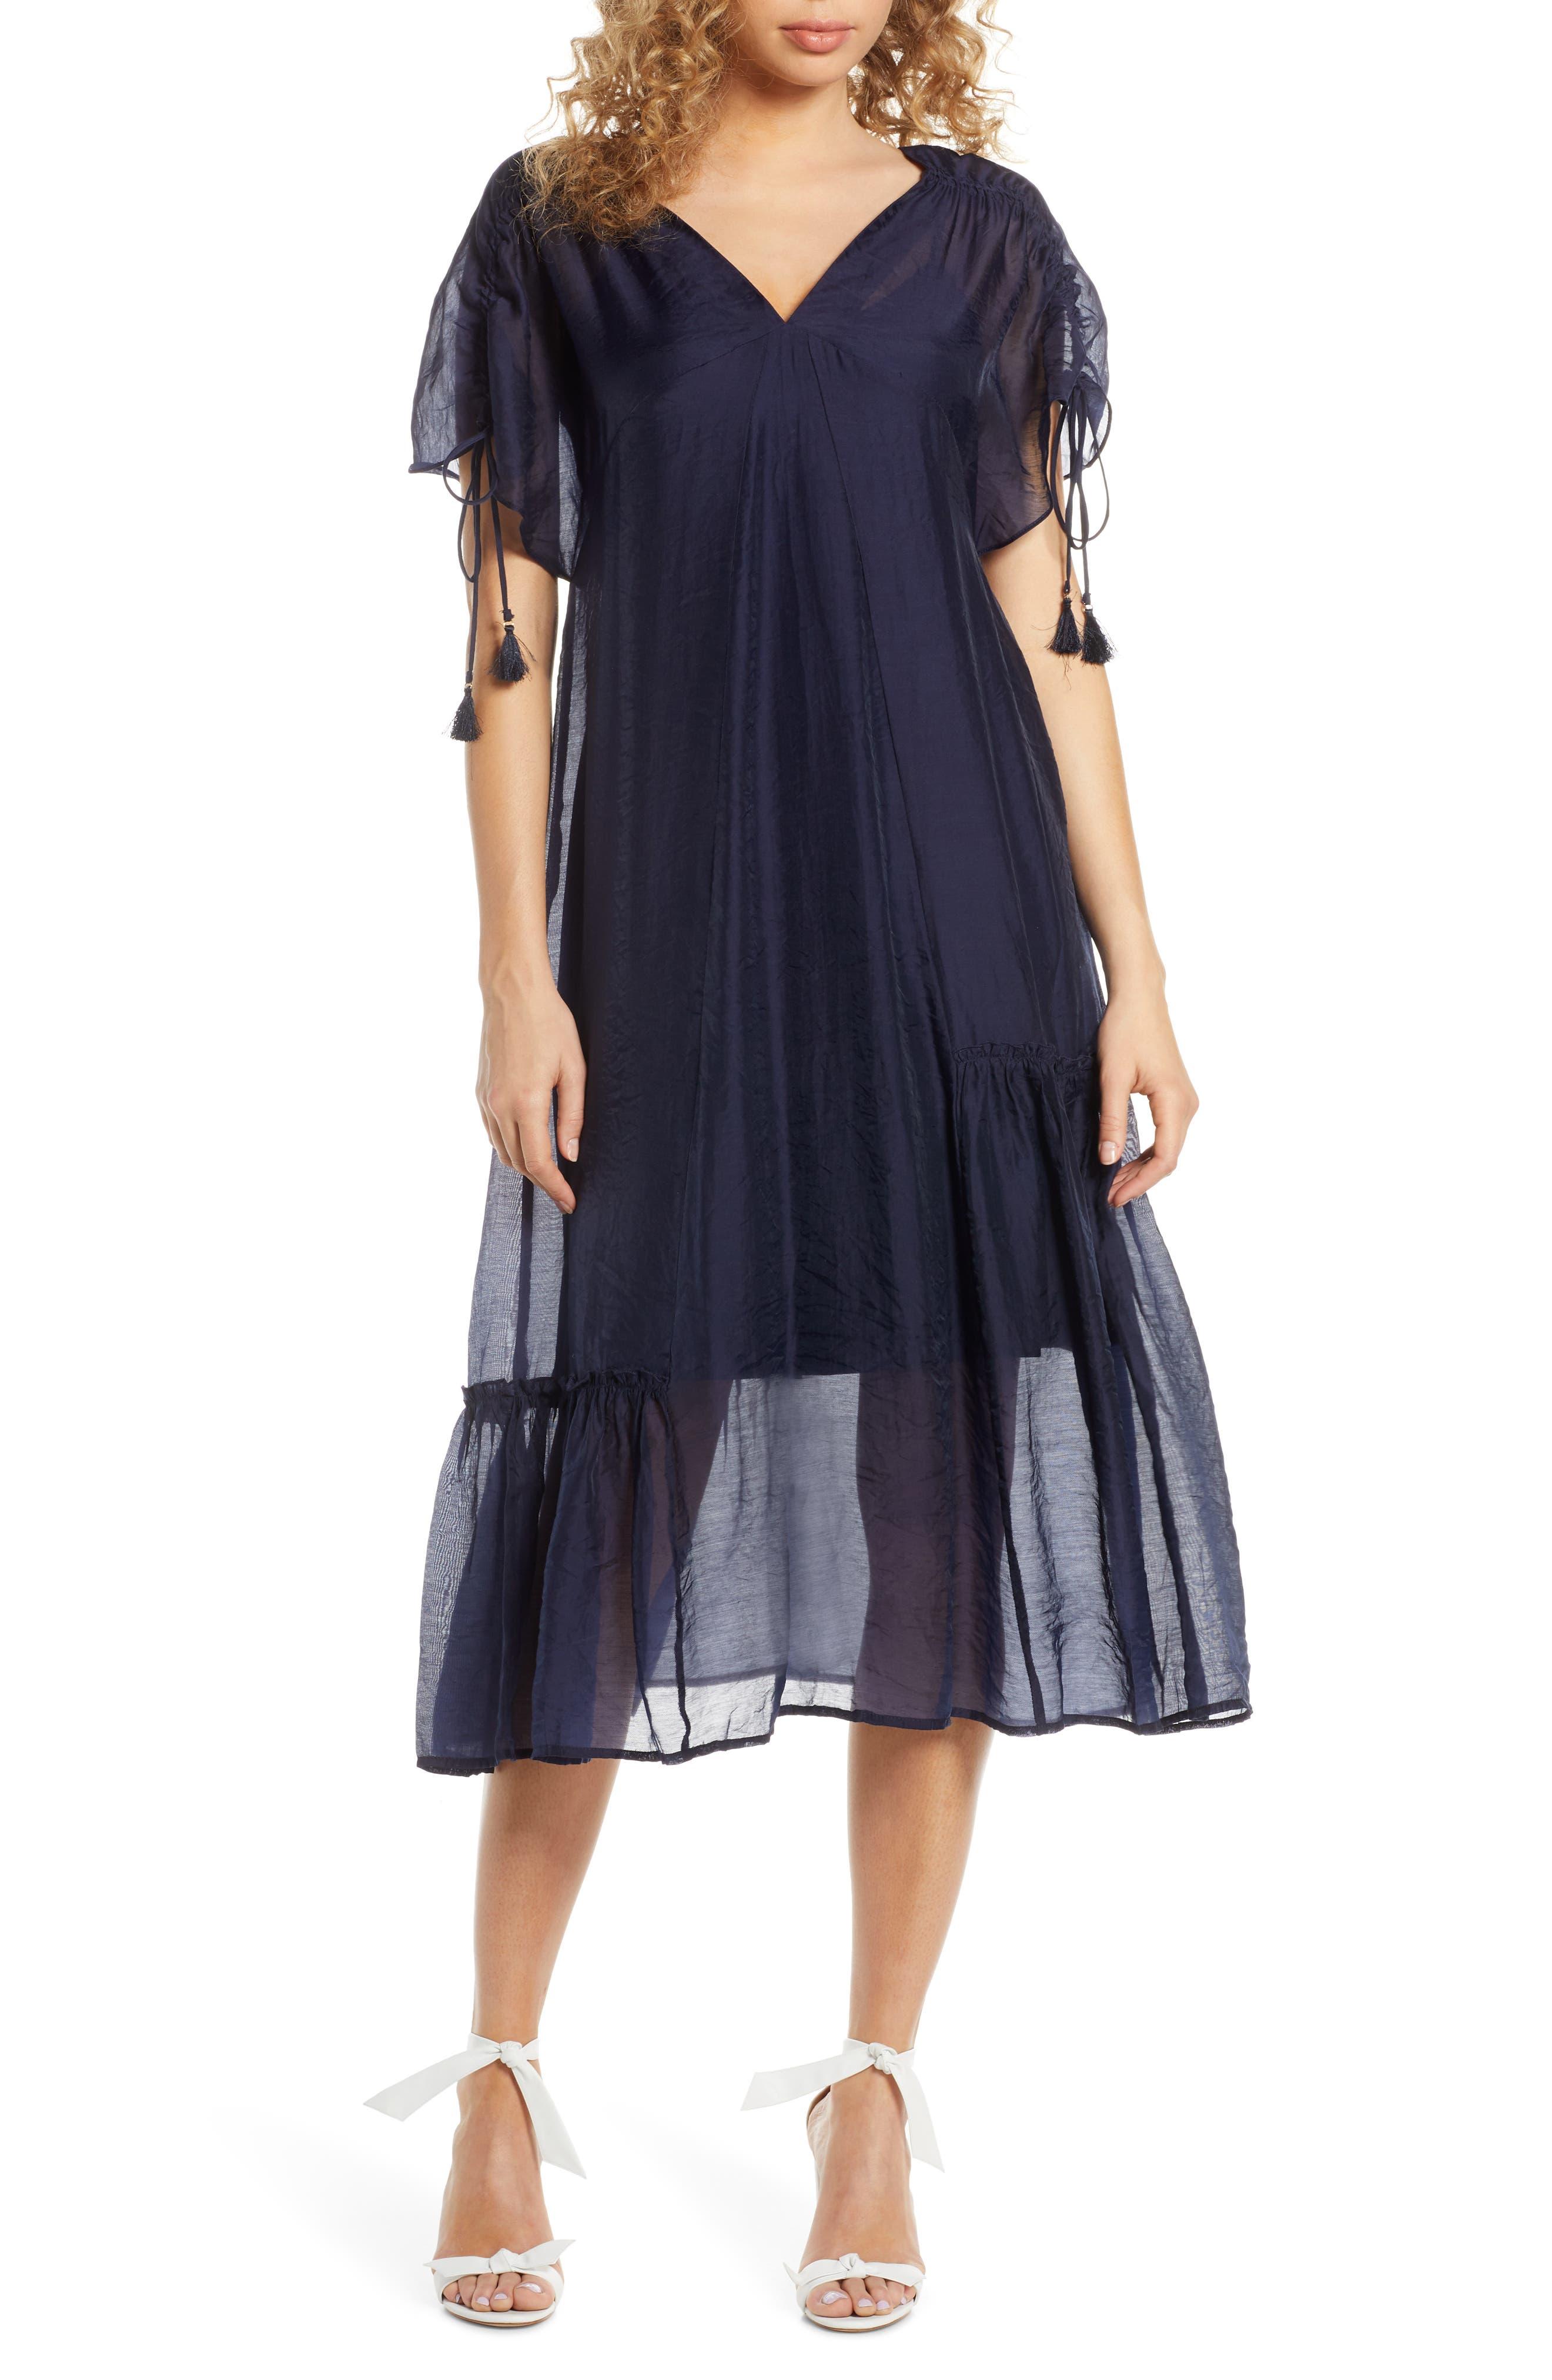 Caara Kendall Tie Sleeve Midi Dress, Blue